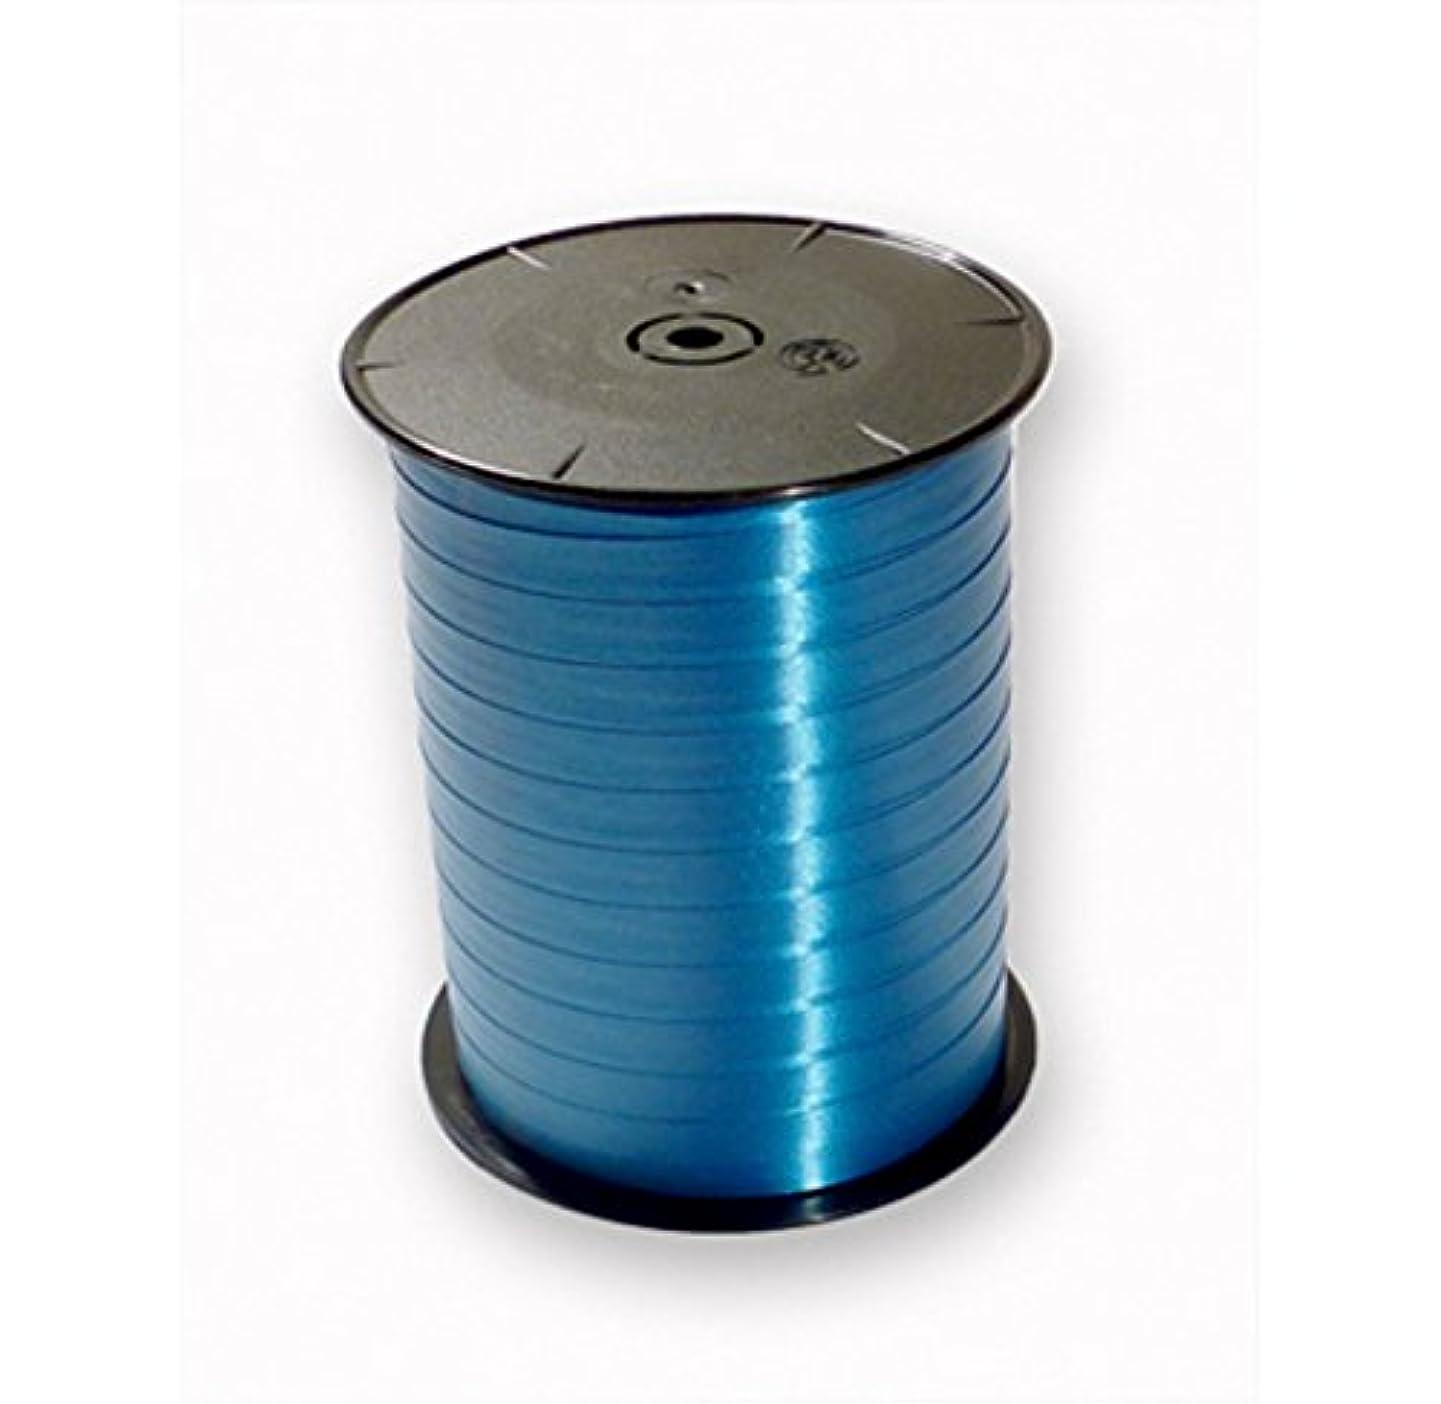 Clairefontaine 601713C 7mm x 500 m Smooth Counter Ribbon Rolls - Blue txeoepkskkzc